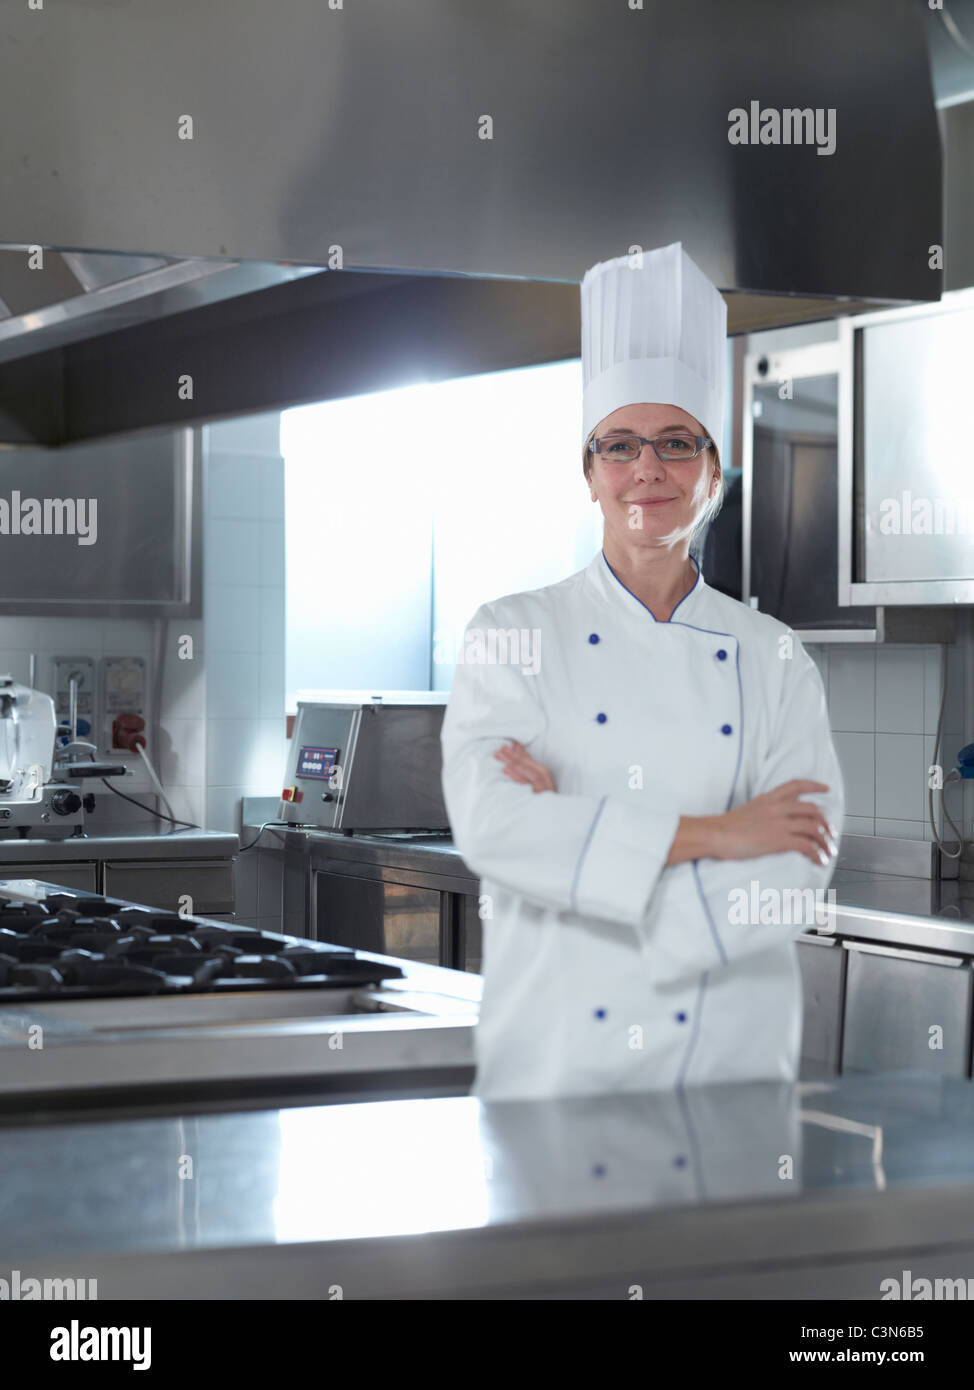 Proud Head Chef standing in his Restaurant Stock Photo: 36730713 - Alamy